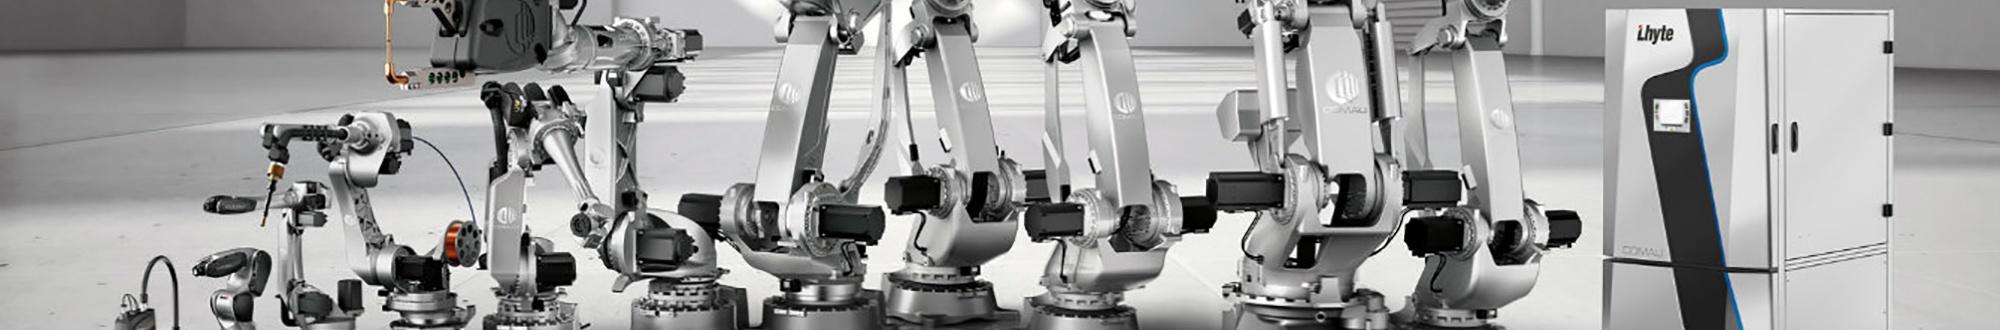 COMAU Robotics - Made in Italy-